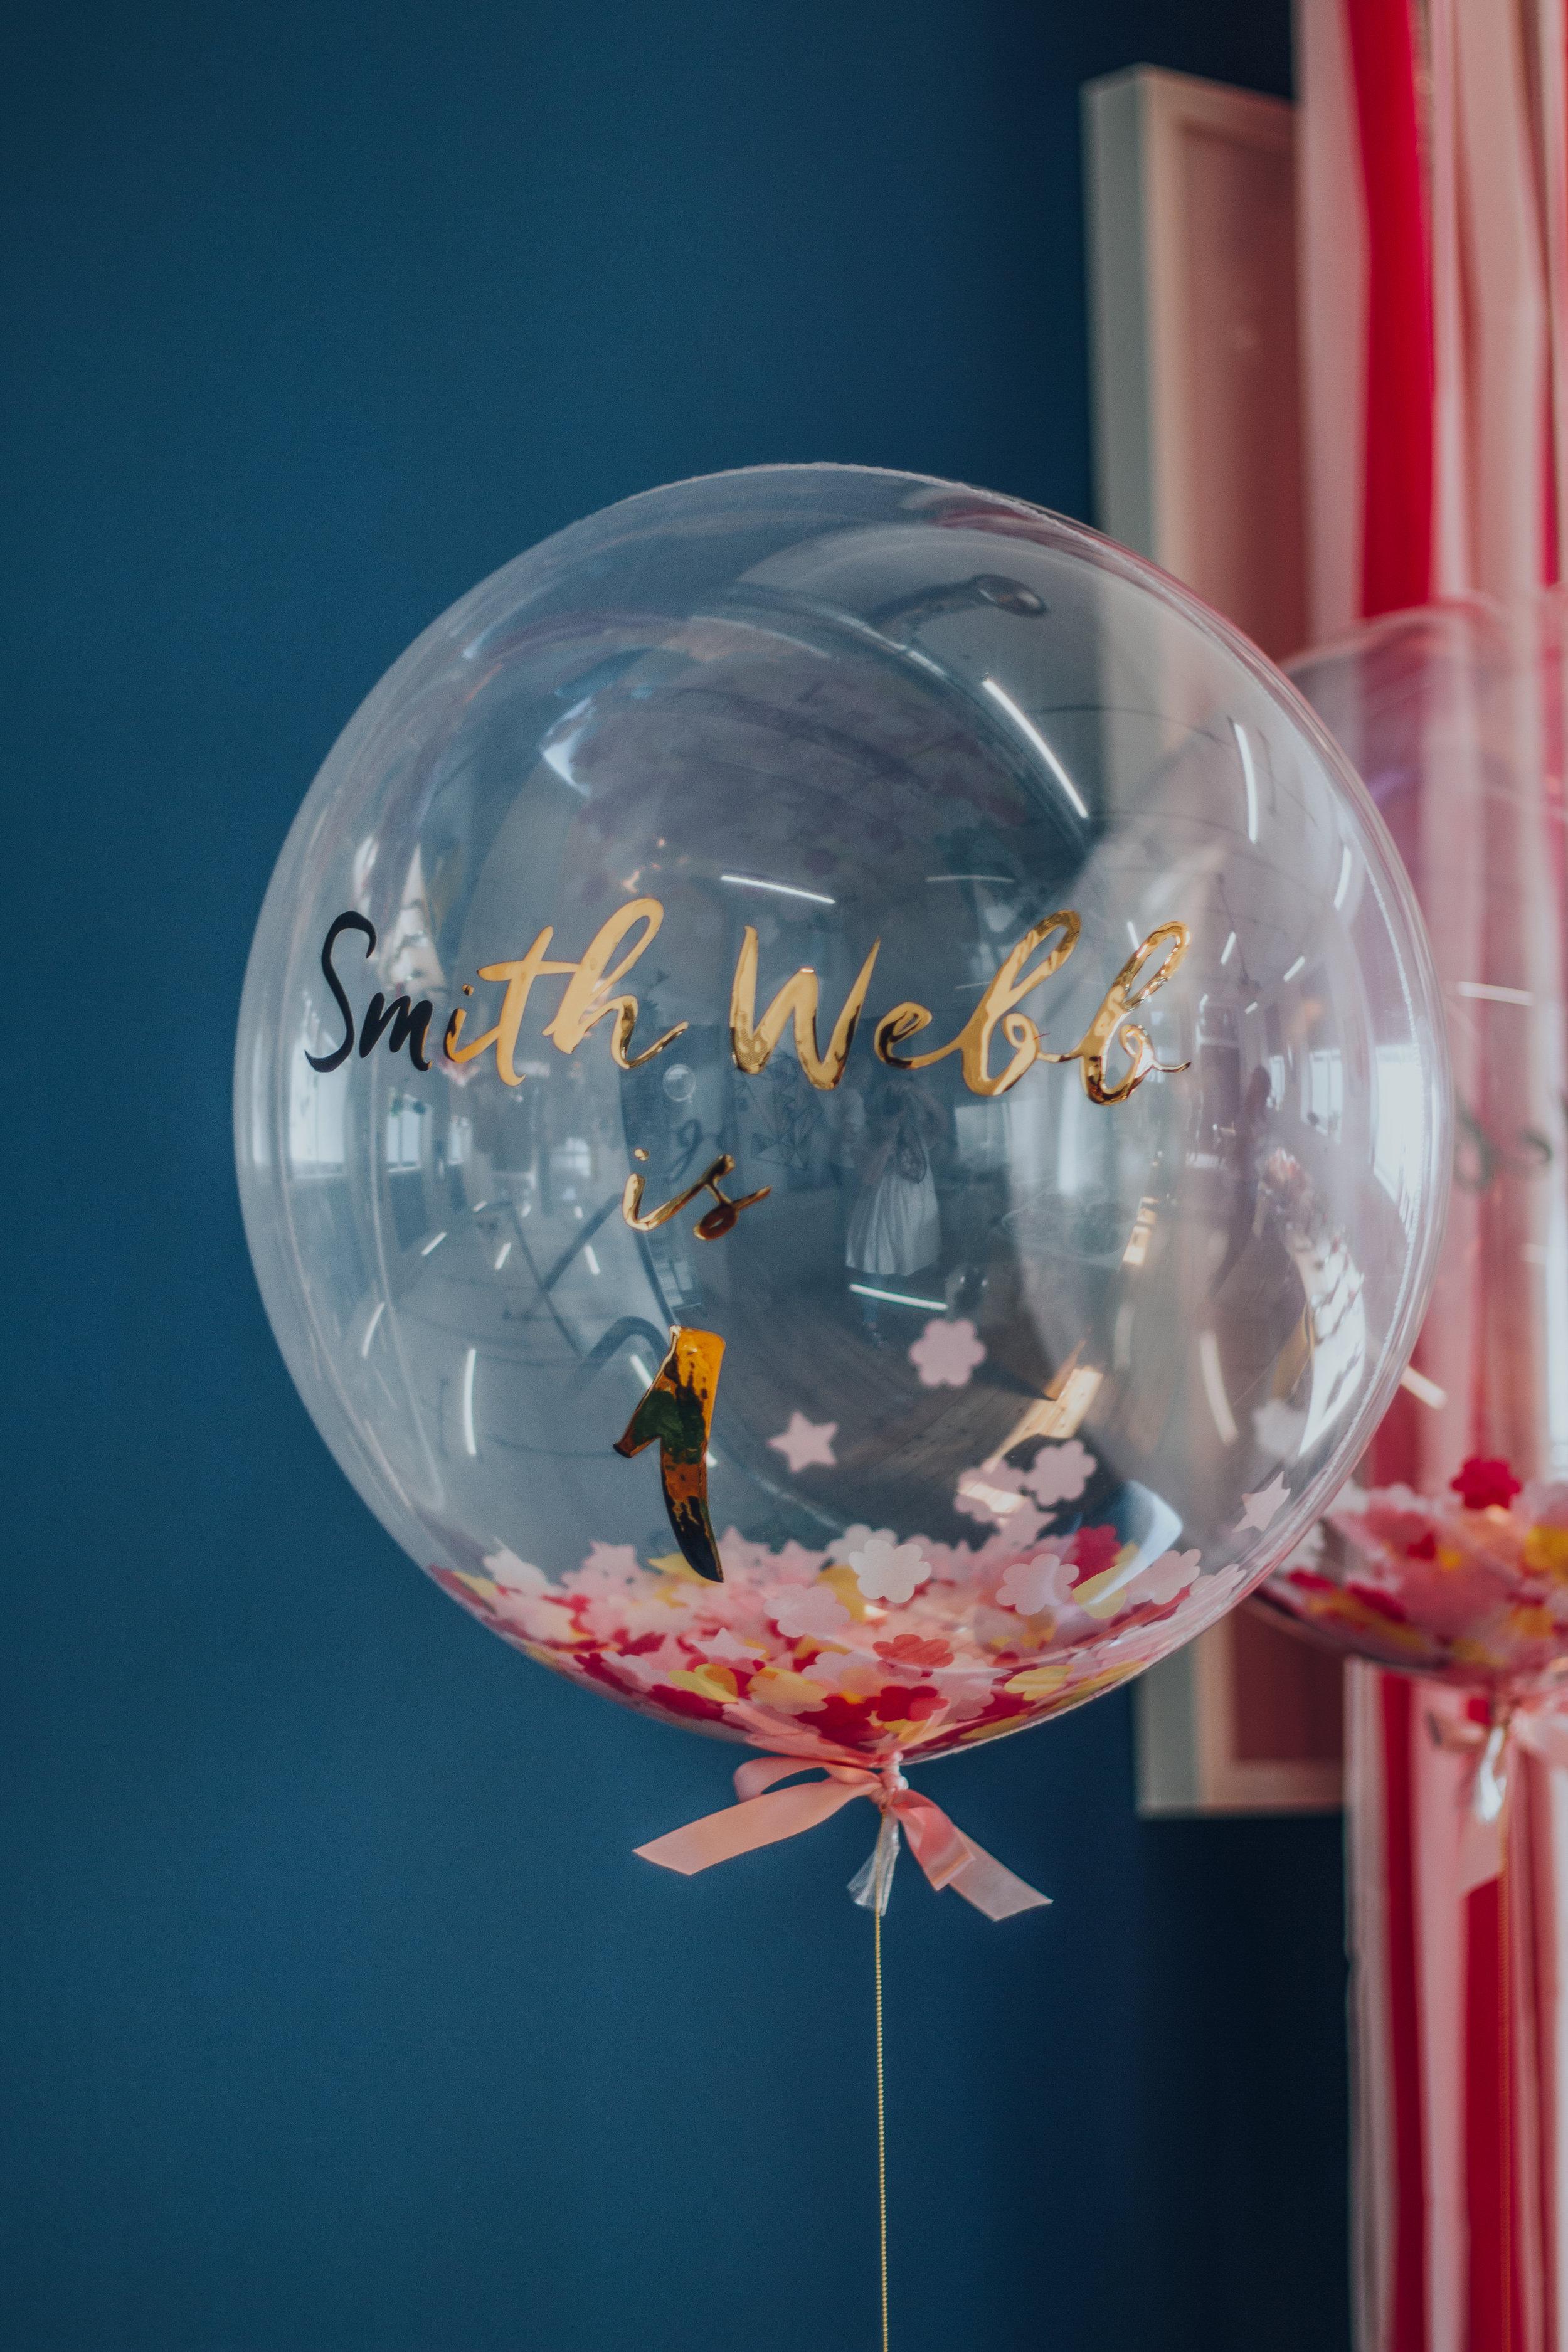 mums-the-word-smith-webb-8.jpg